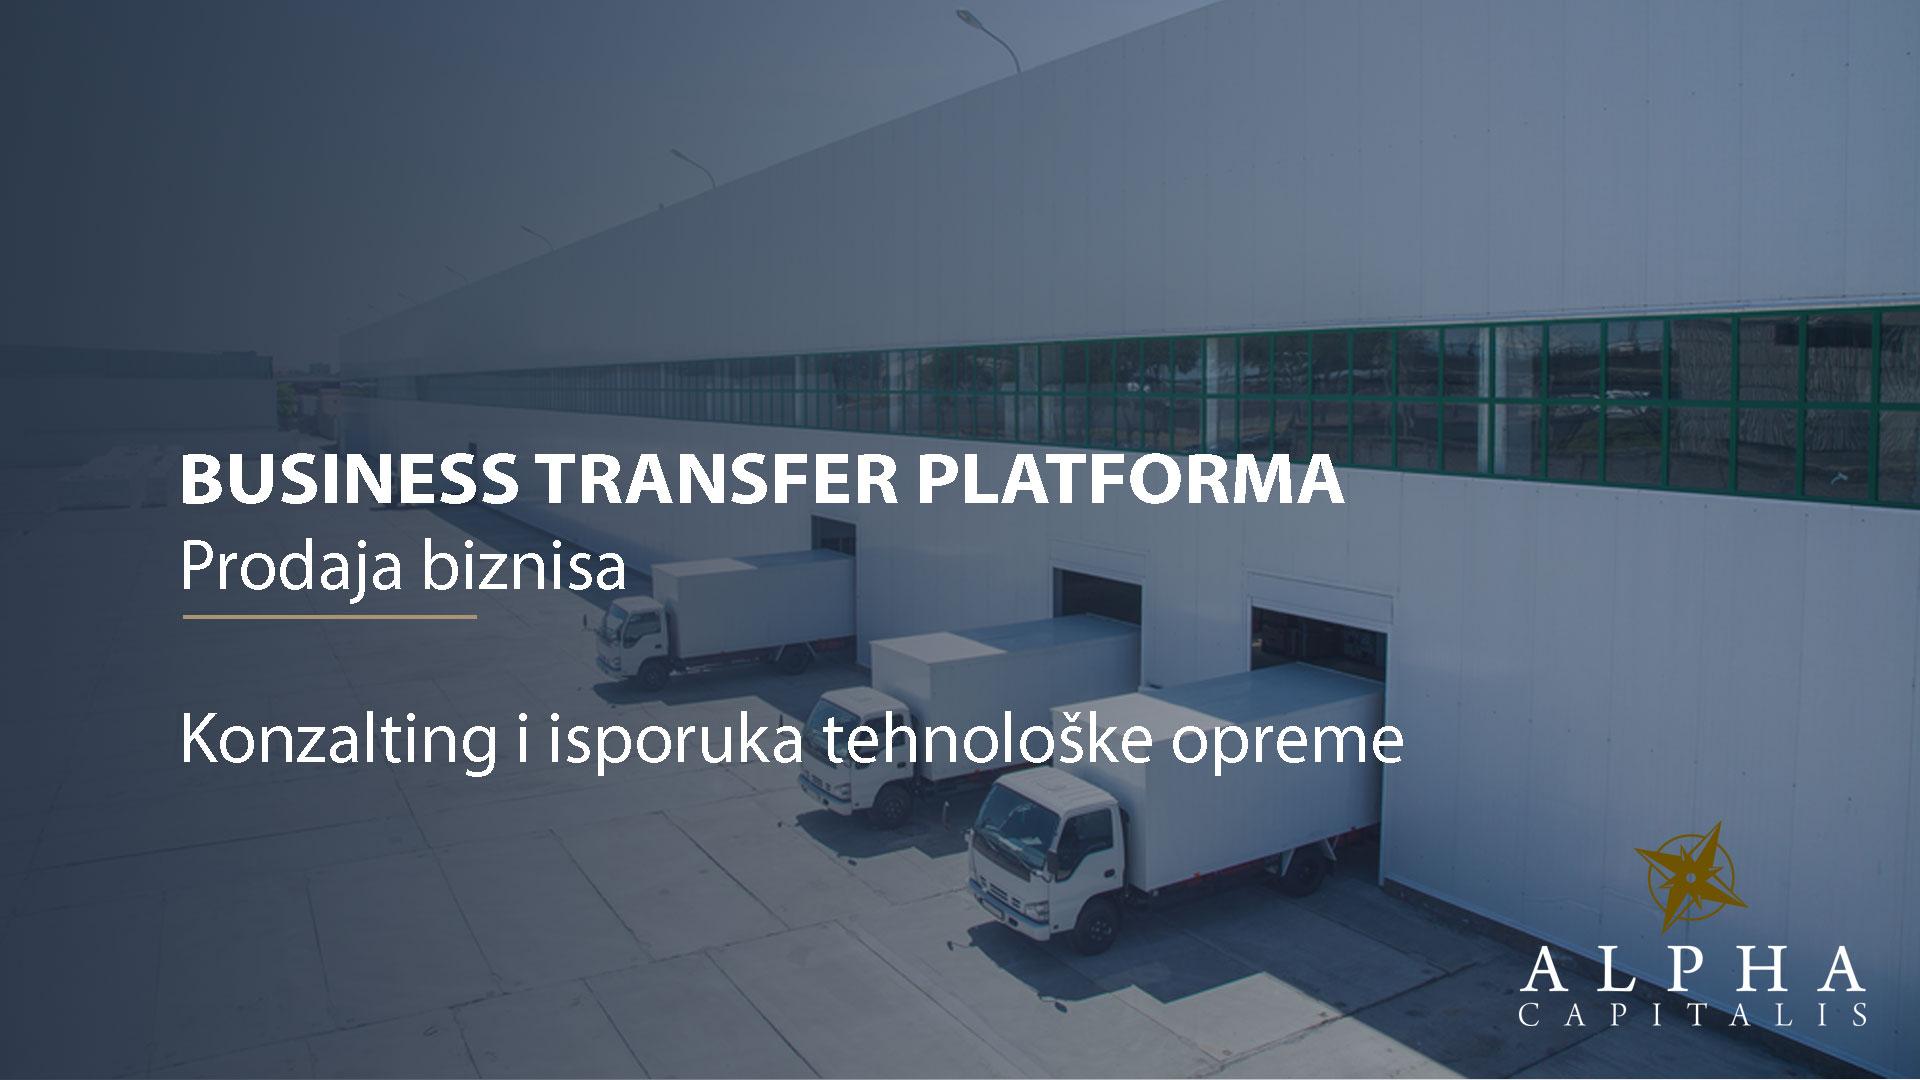 Business-transfer-platforma-distribucija